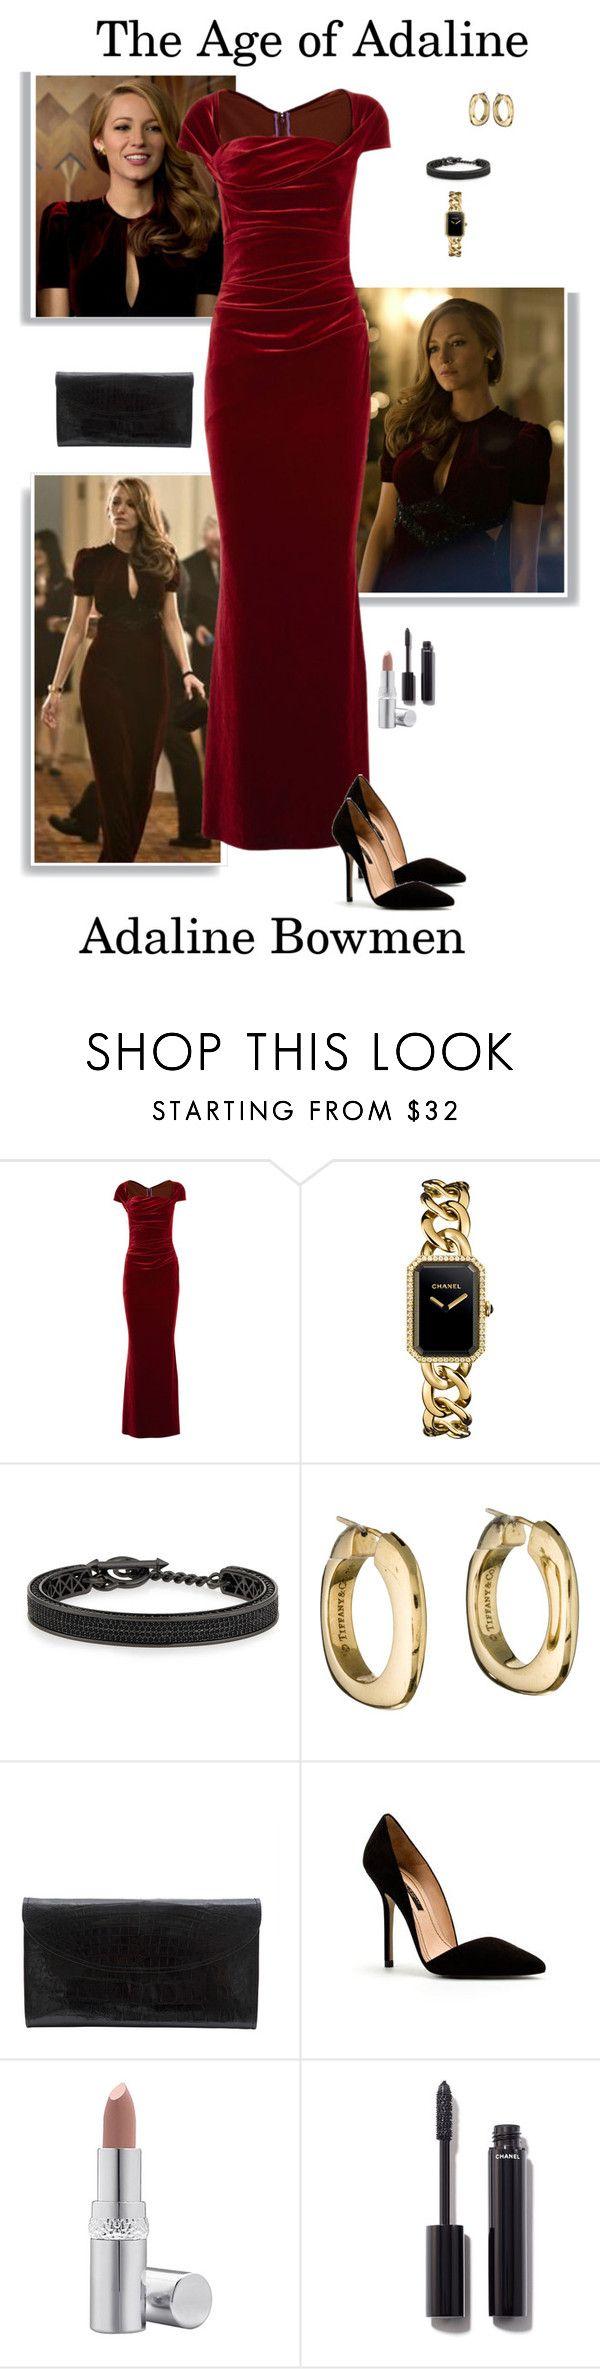 """Adaline Bowman - The Age of Adaline"" by gone-girl ❤ liked on Polyvore featuring Talbot Runhof, Chanel, Eddie Borgo, Tiffany & Co., Gallard, Zara, La Prairie, Theageofadaline, Adaline and AgeofAdaline"